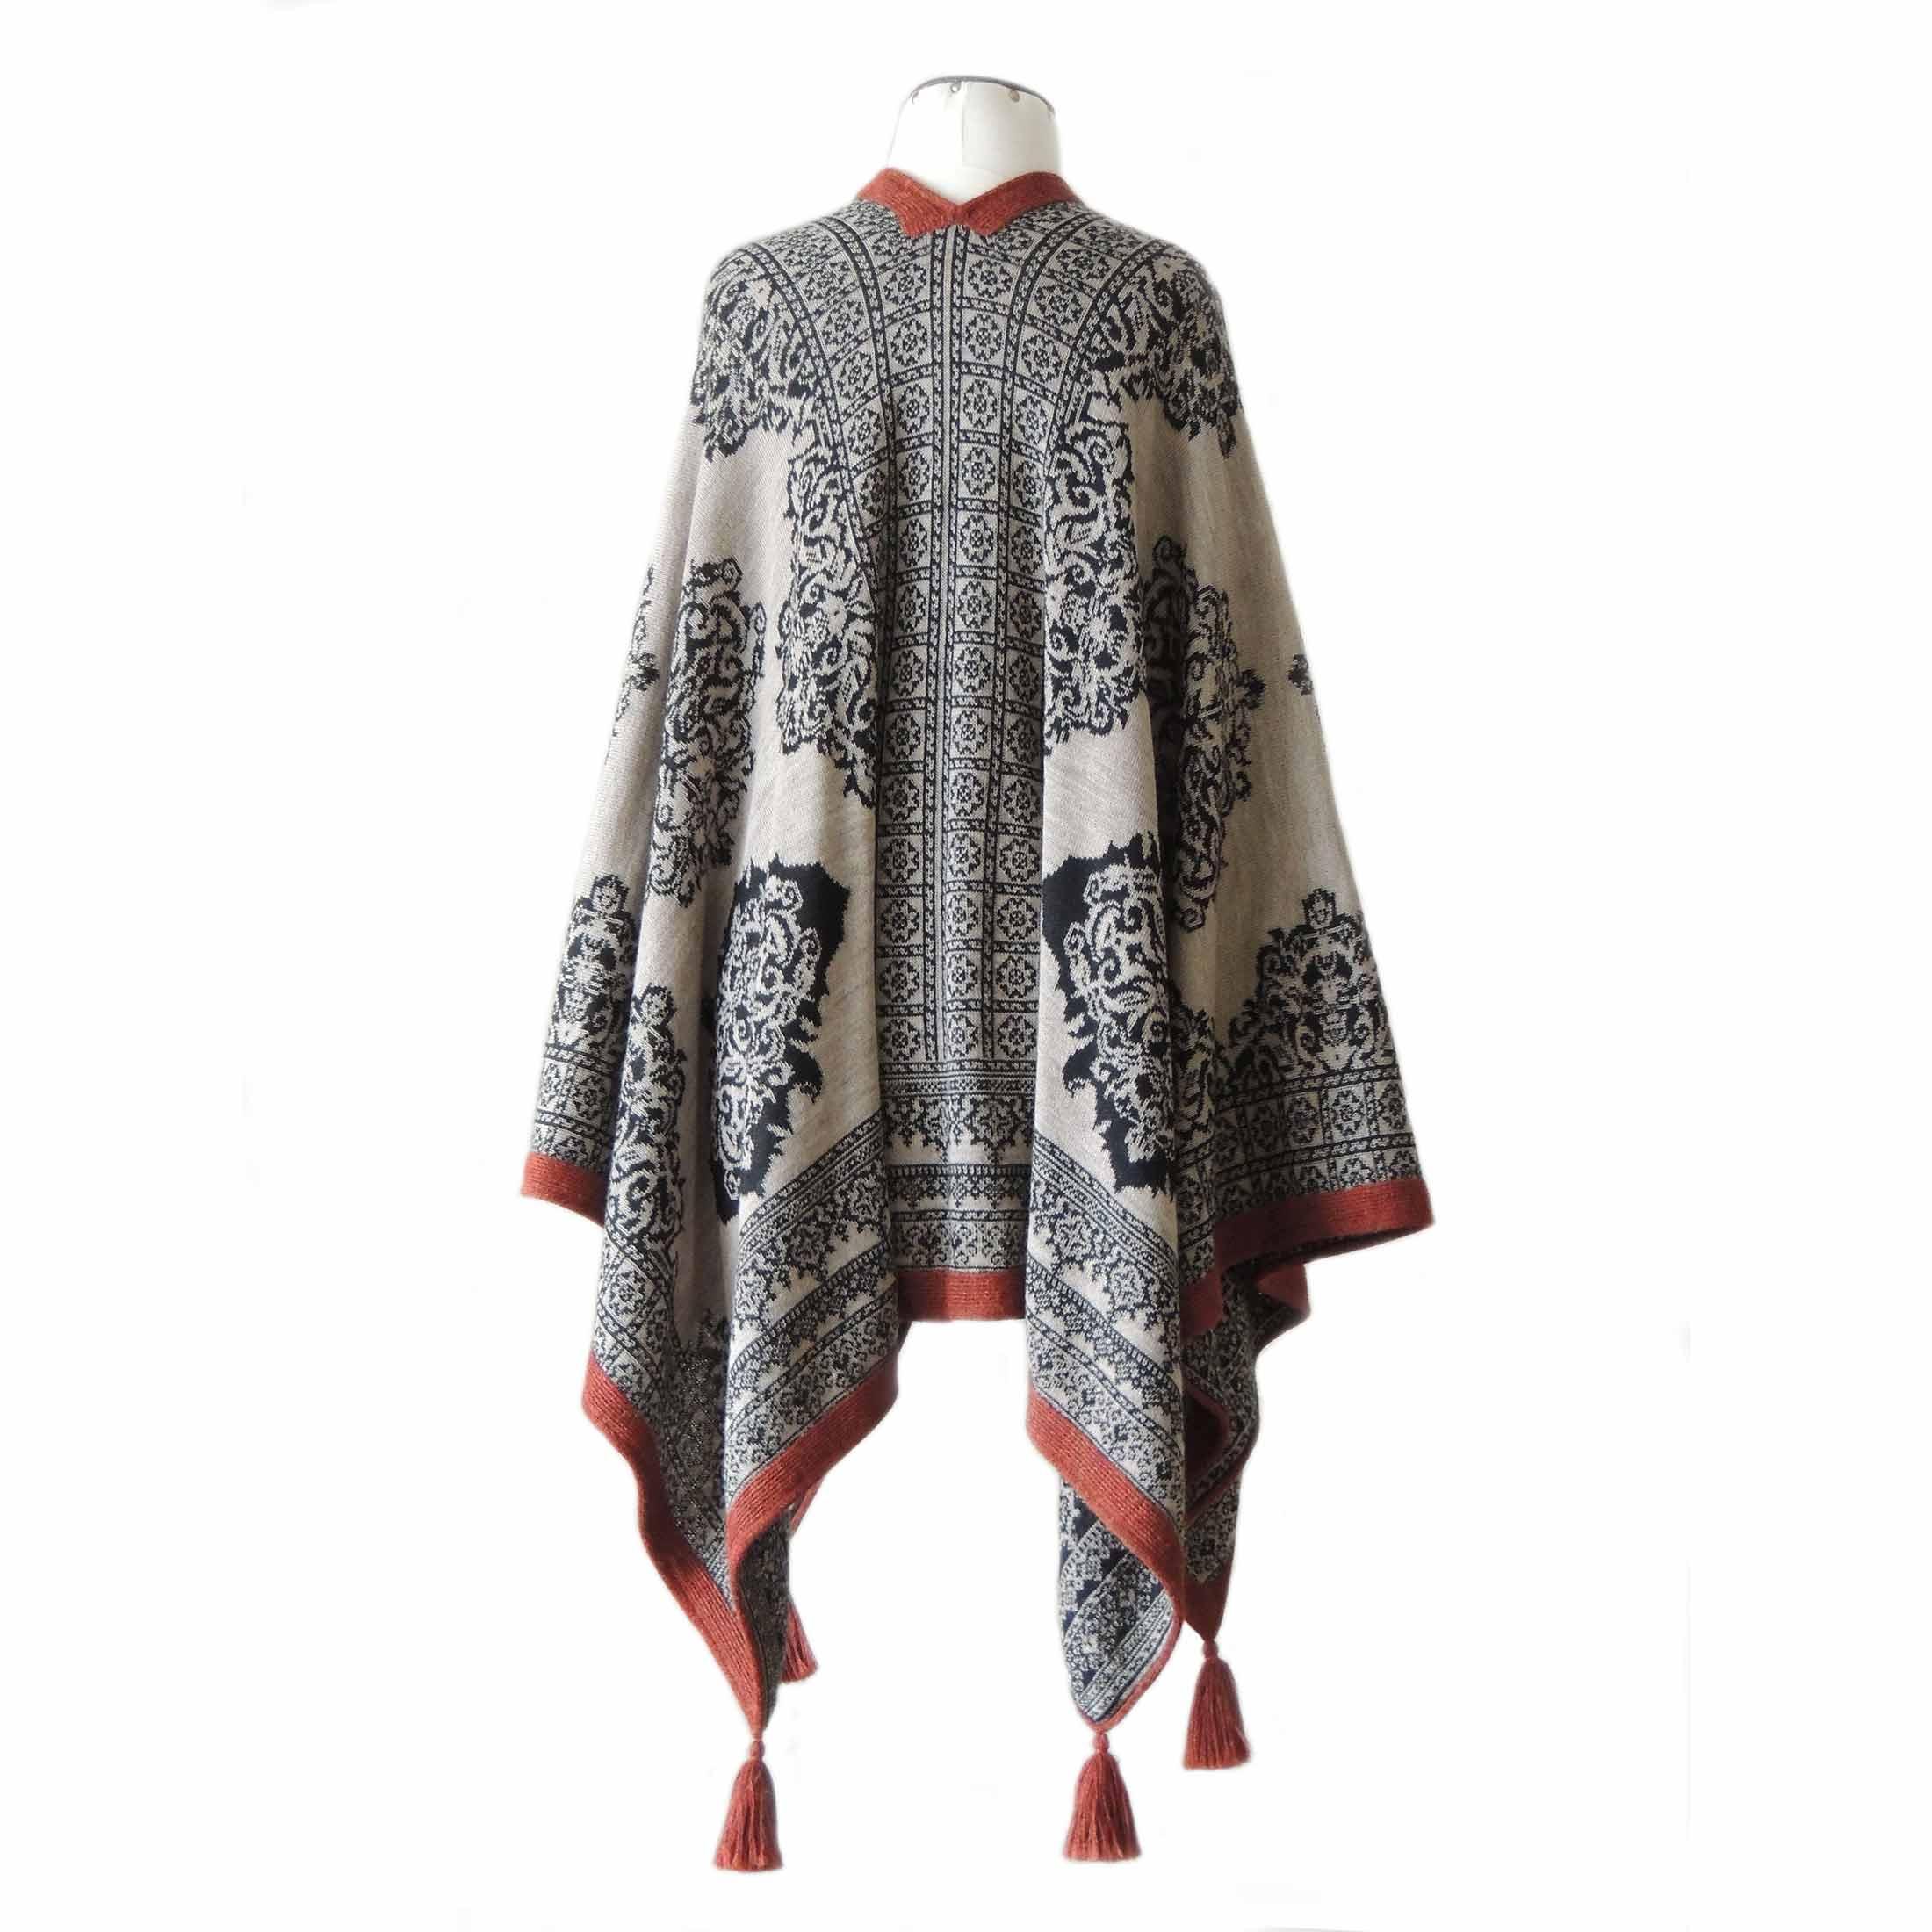 PopsFL knitwear wholesale Women's ruana - wrap reversible jacquard knitted with pattern and tassels 100% baby alpaca.